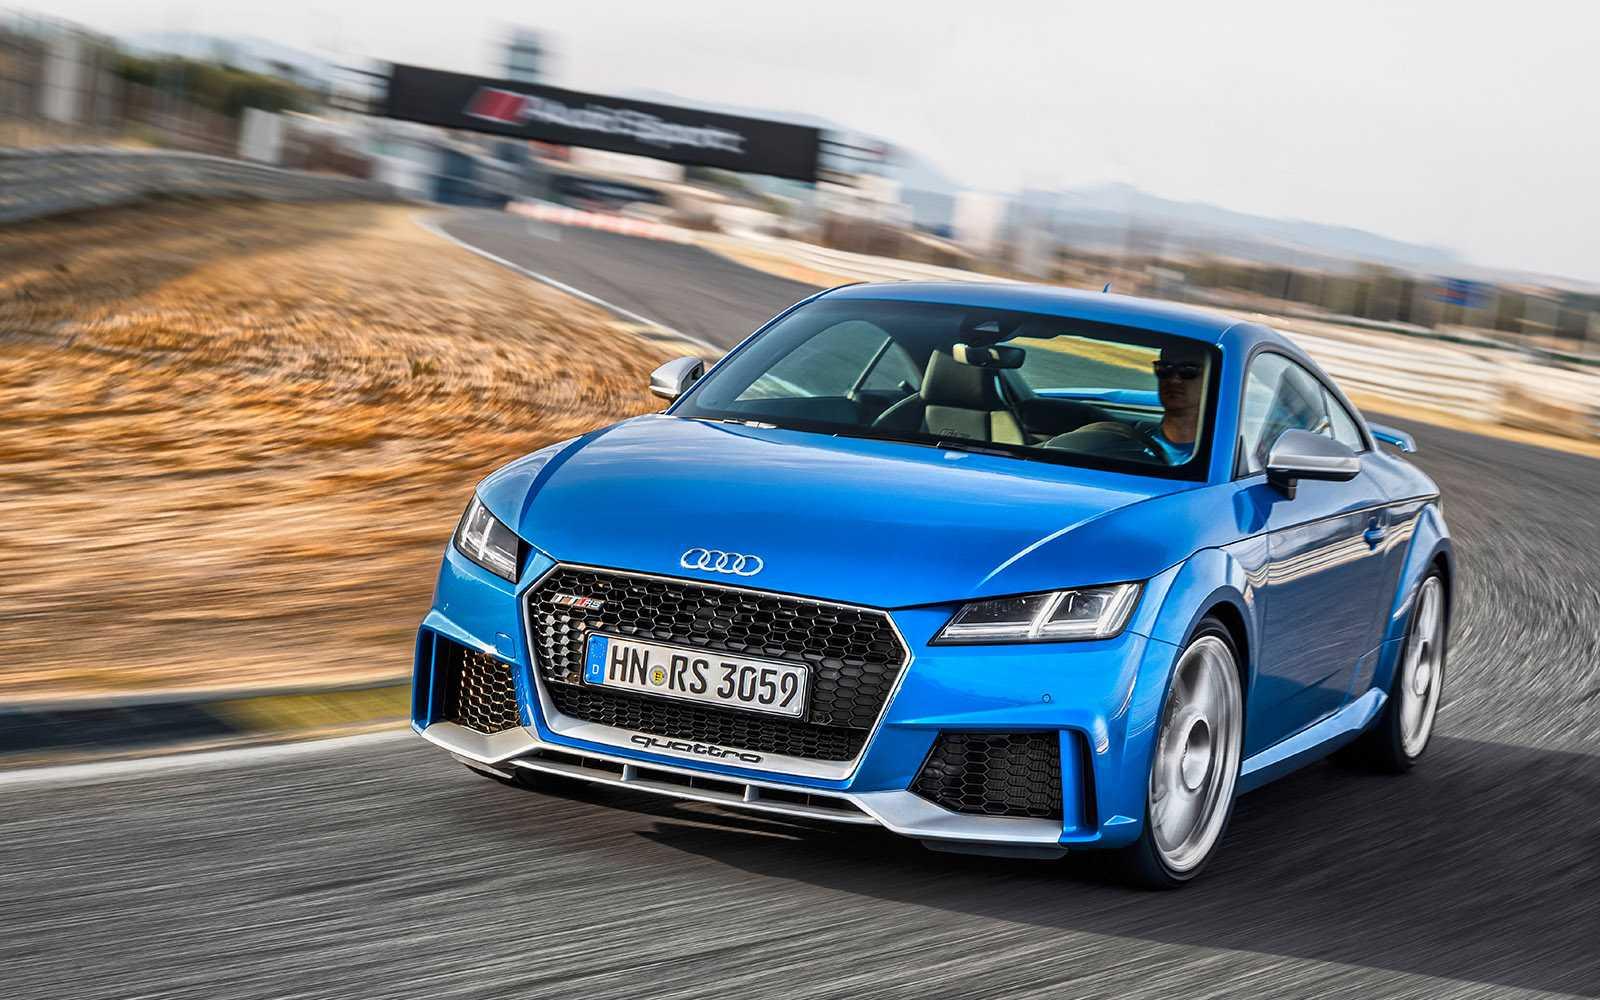 Audi tt 2.0 tfsi quattro s tronic (10.2014 - 03.2019) - технические характеристики